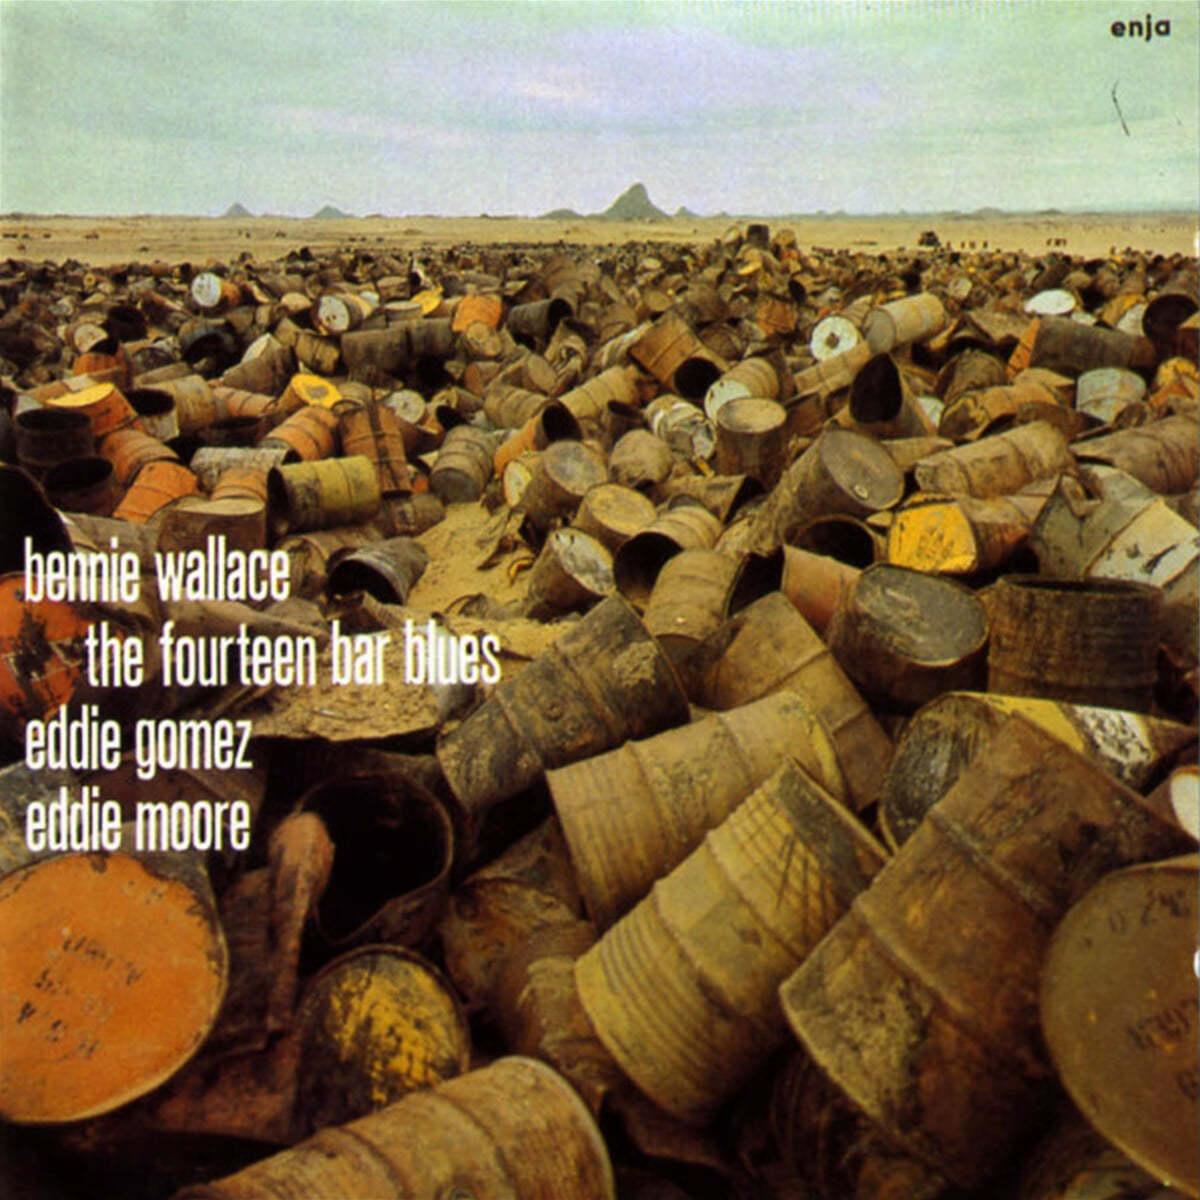 Bennie Wallace / Eddie Gomez / Eddie Moore (베니 월래스 / 에디 고메즈 / 에디 무어) - The Fourteen Bar Blues